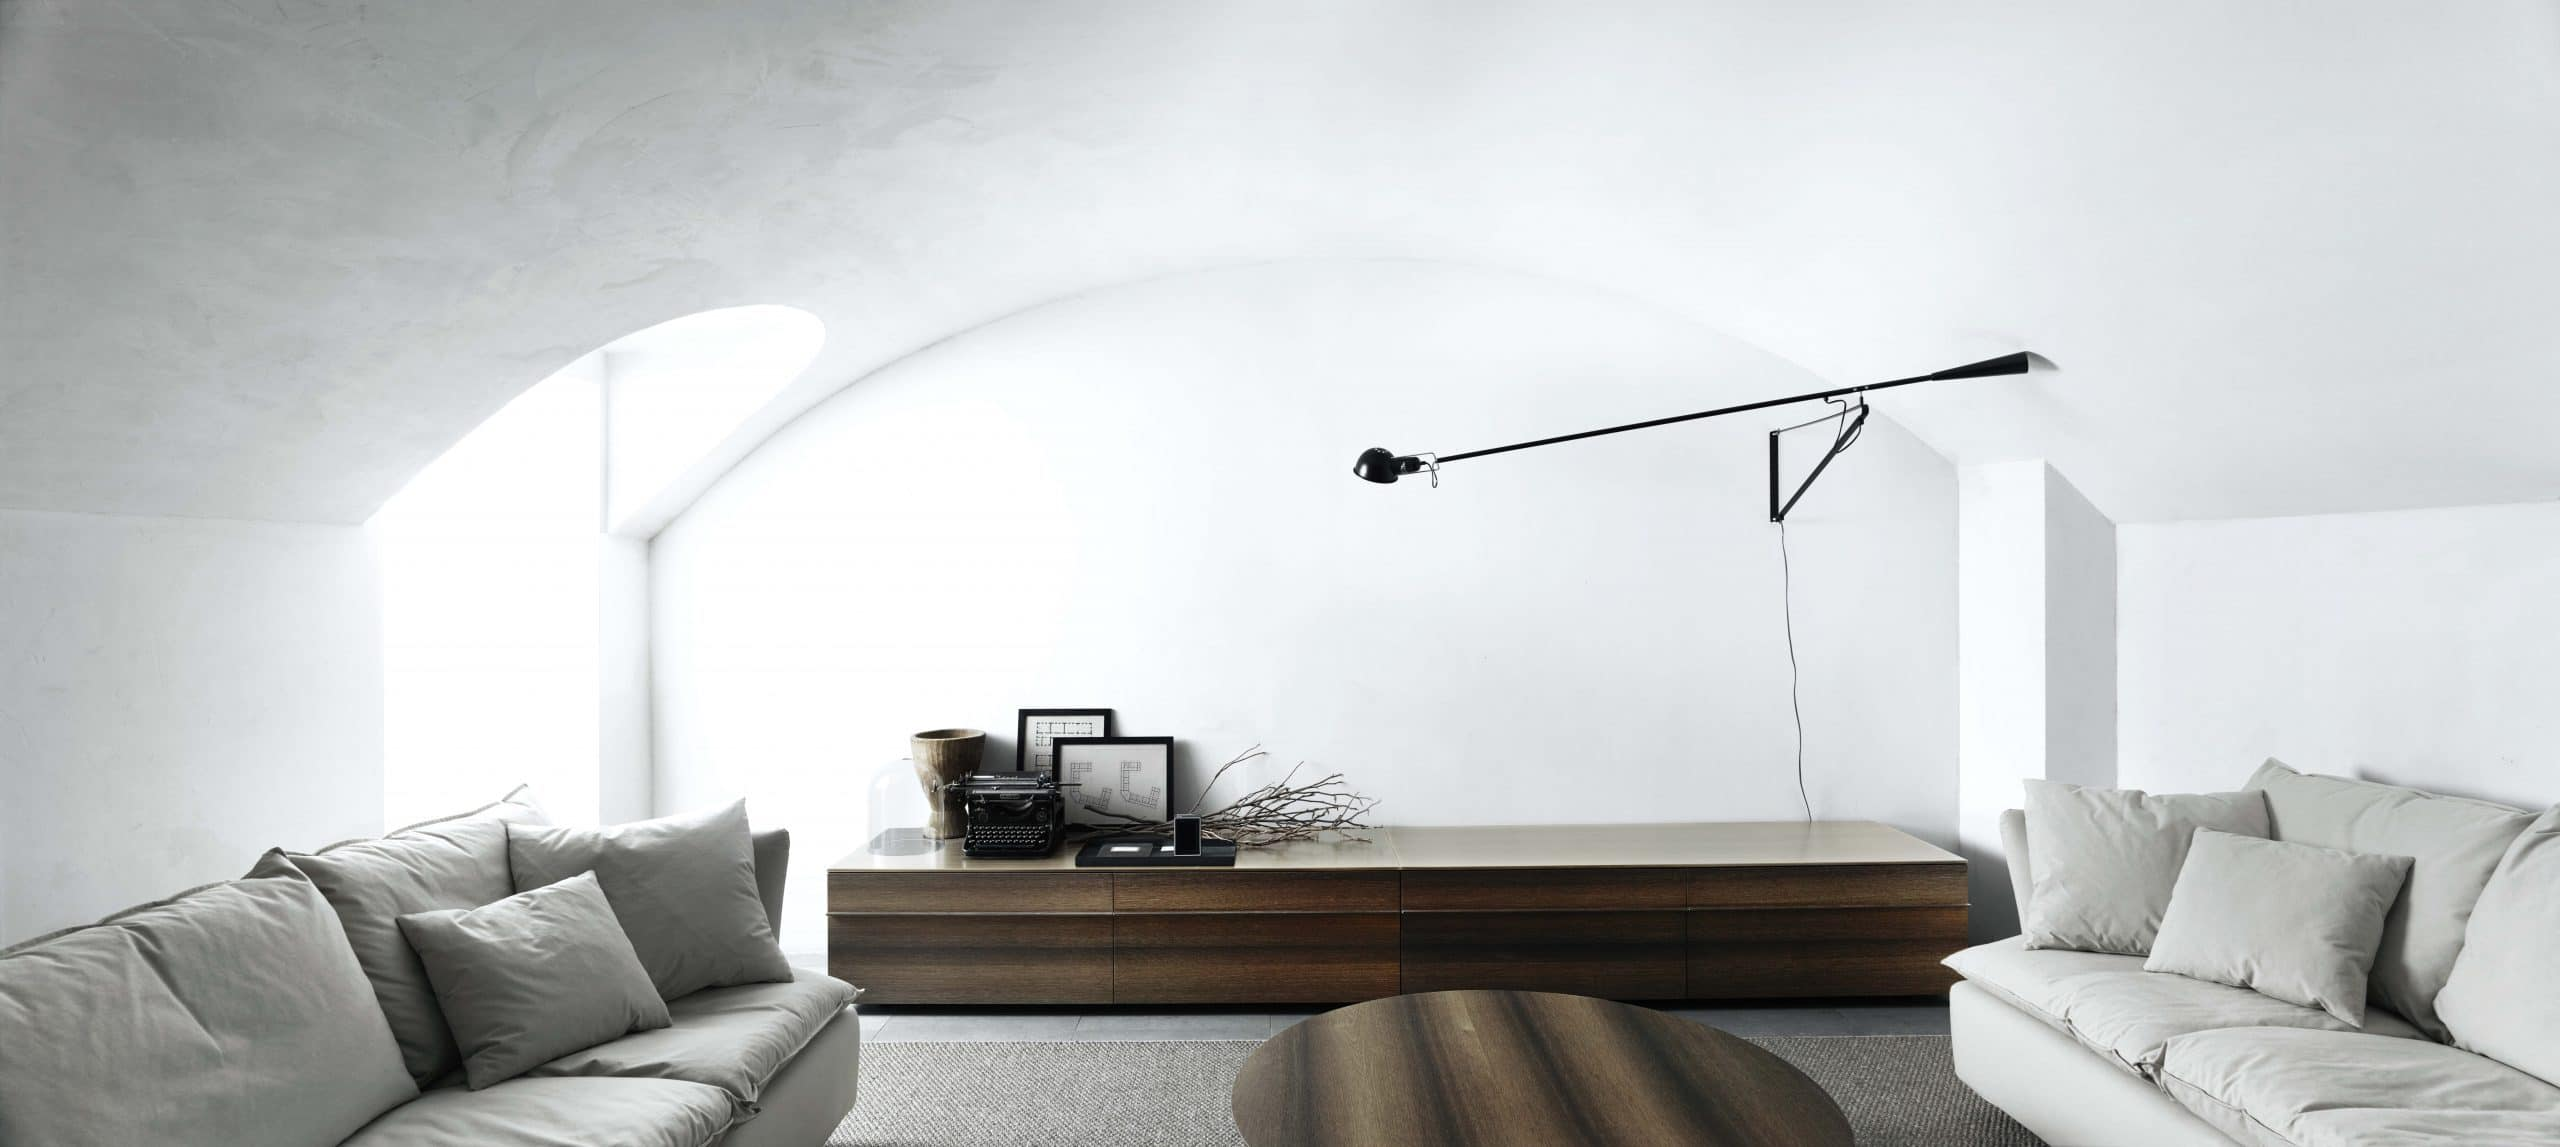 Living room interior designed by Boffi Studio Rotterdam